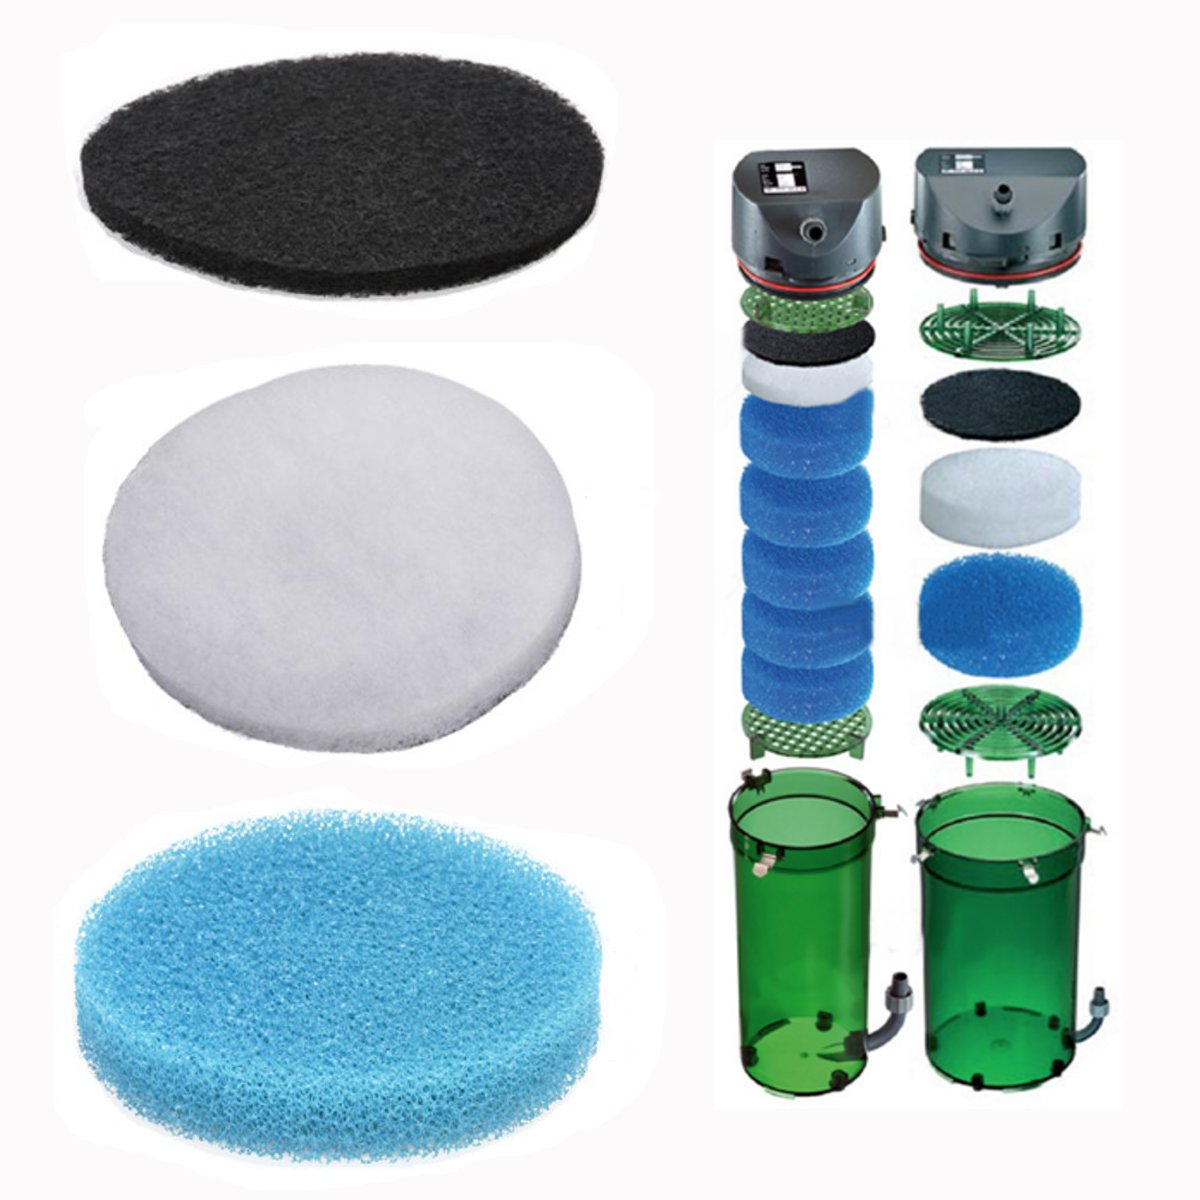 Fish Tank Aquarium Biochemical Carbon Cotton Filter Foam Sponge Pack For EHEIM Classic 250 Dirt Filtration Accessories Gadgets